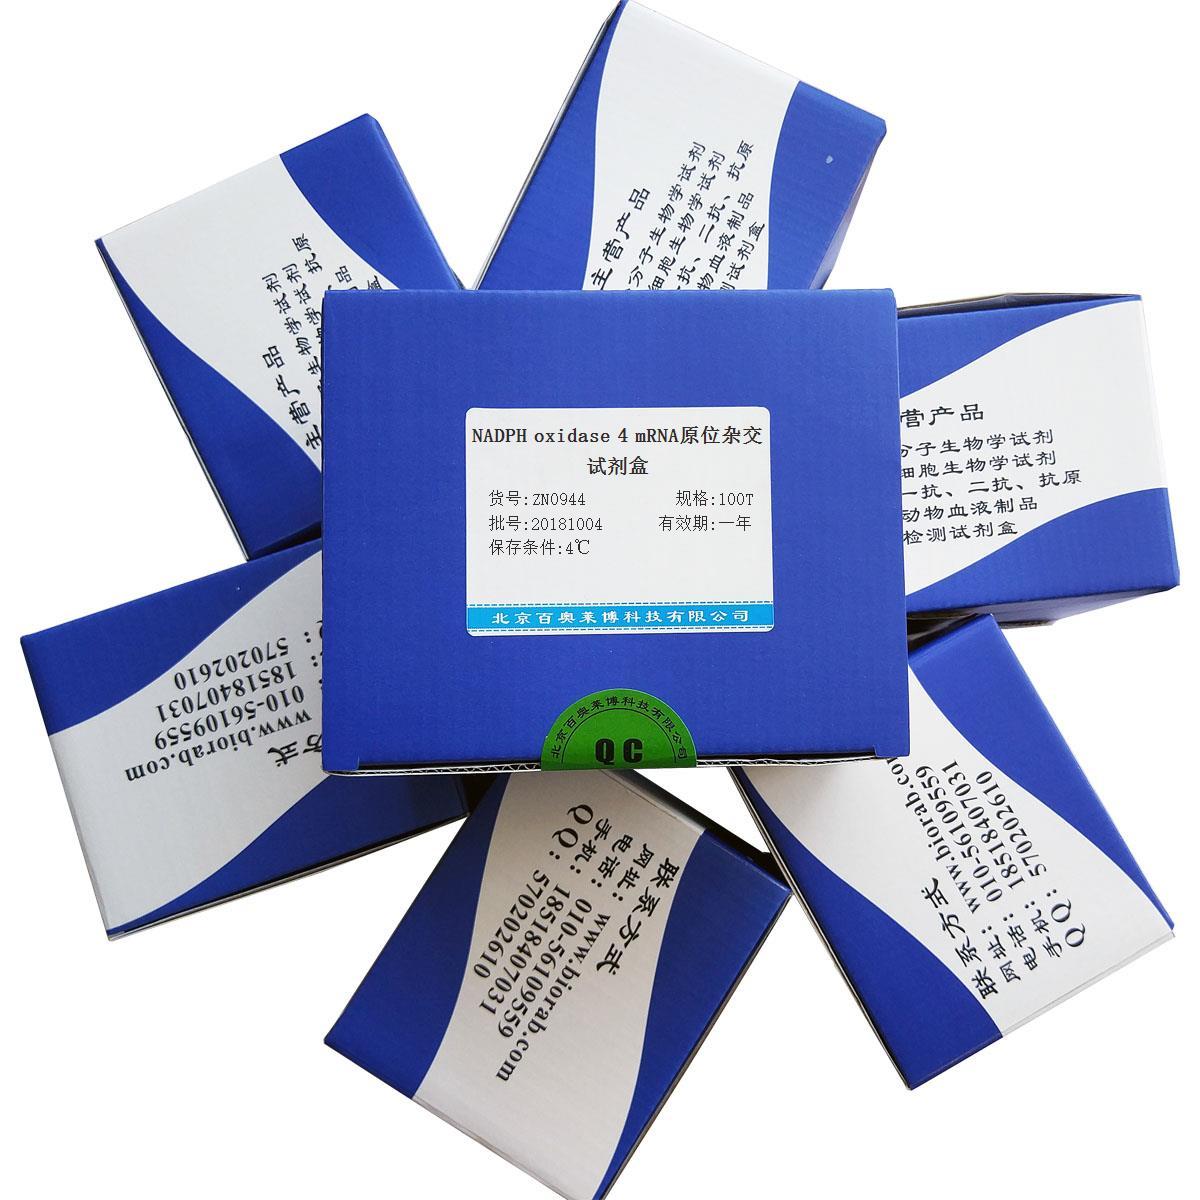 NADPH oxidase 4 mRNA原位杂交试剂盒